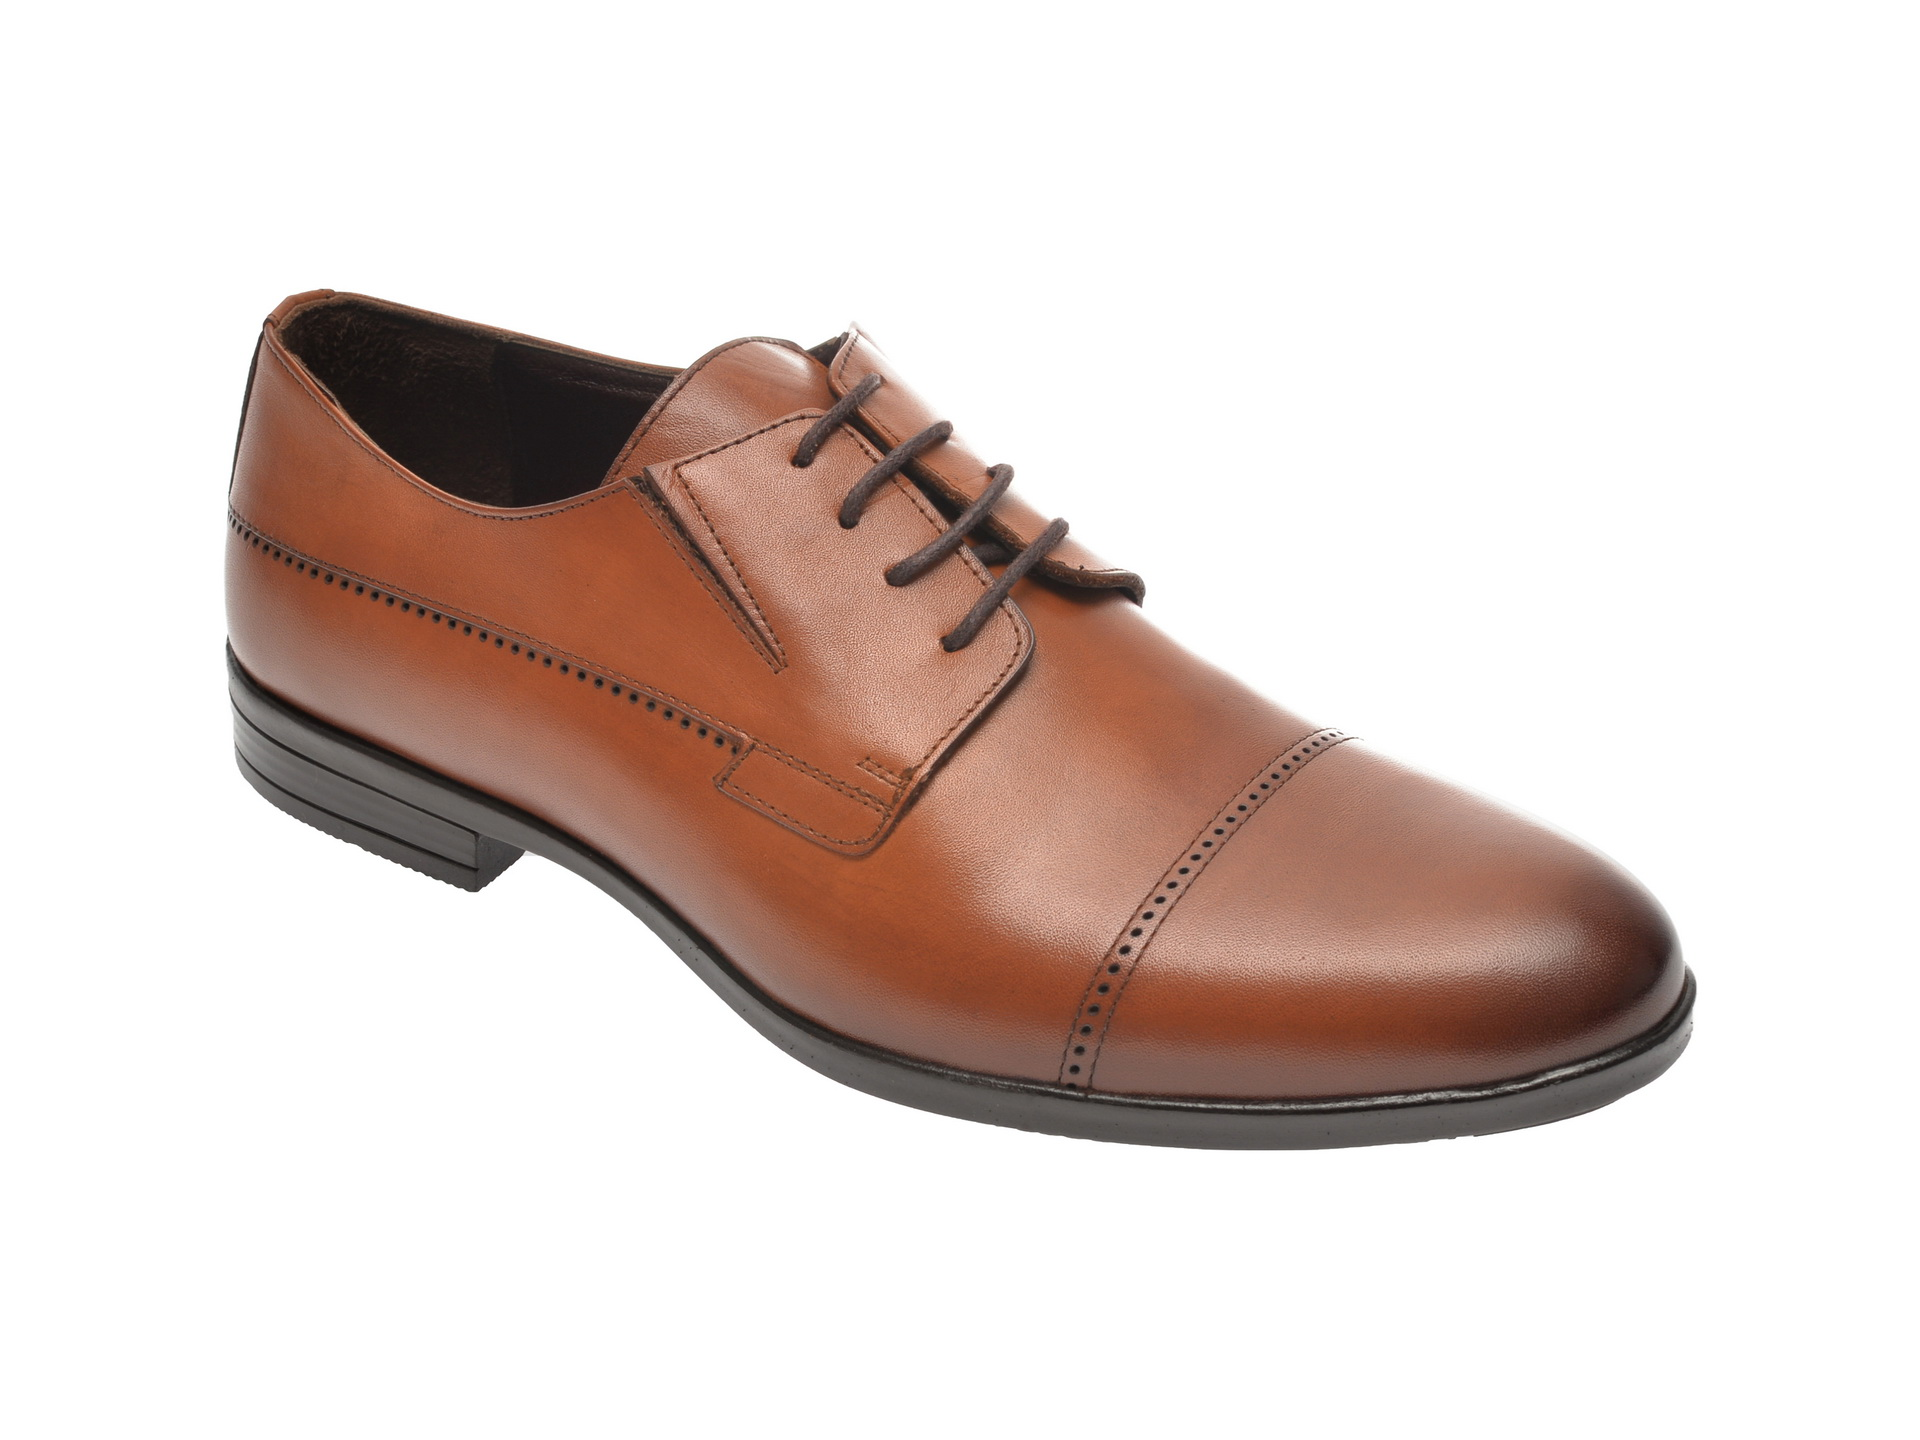 Pantofi OTTER maro, K34, din piele naturala